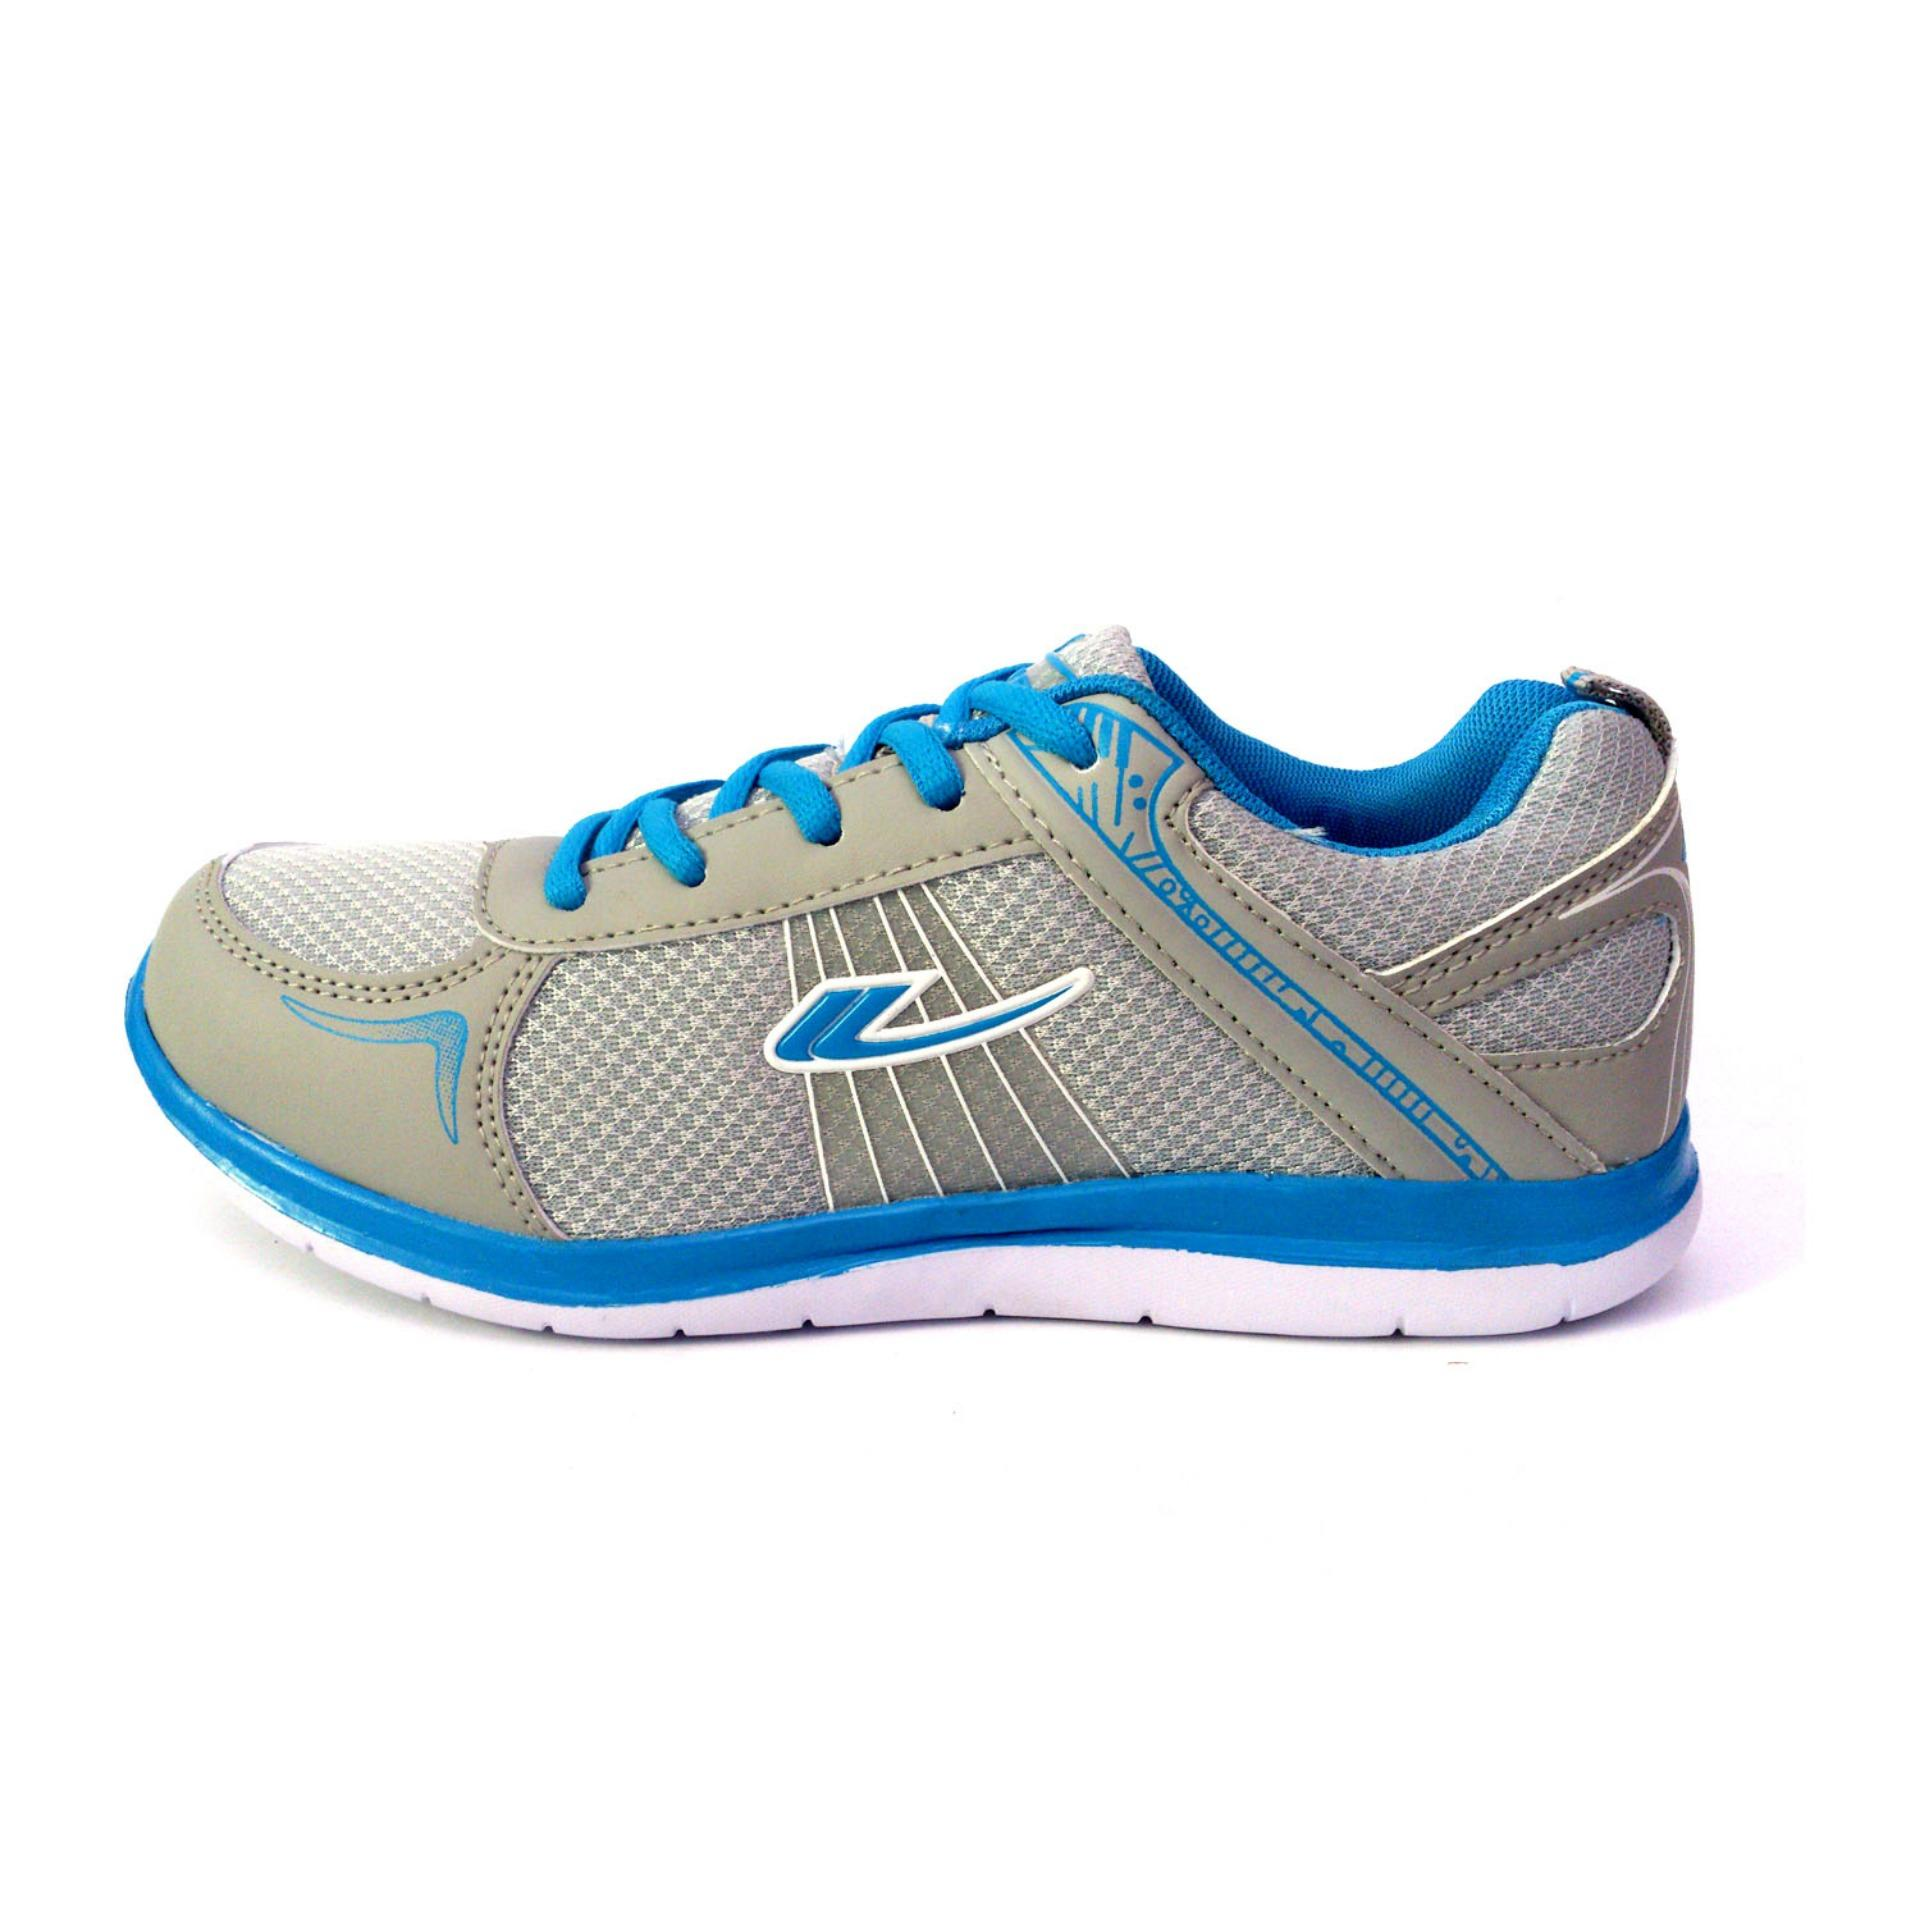 Jual New Era Amora Sepatu Olahraga Sepatu Lari Wanita High Quality Online Indonesia